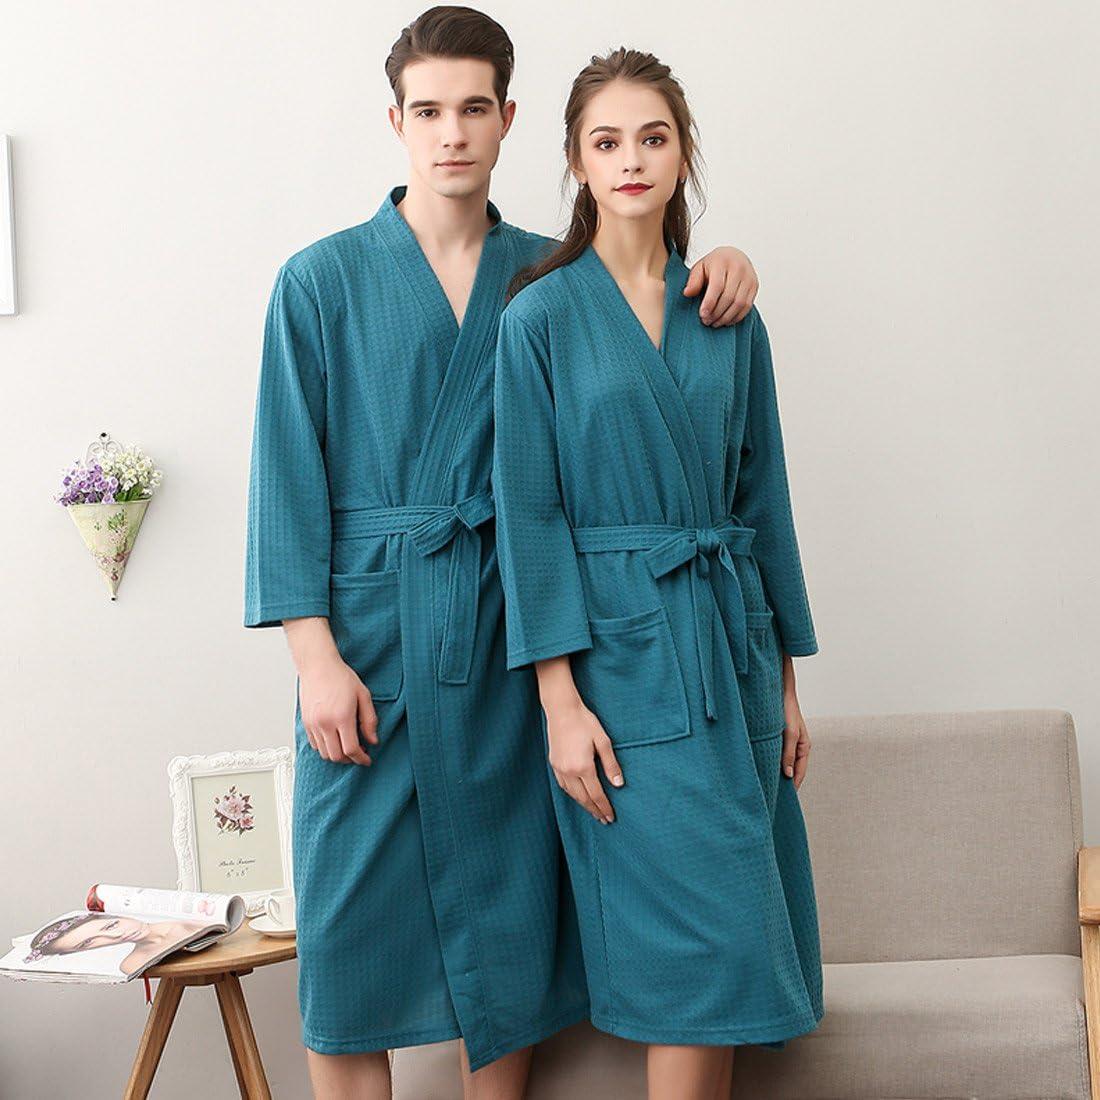 SUIMO Rosa Violeta Gris Verde Albornoz Grueso de Invierno Oto/ño Bata de Ba/ño Kimono Unisex para Hombre Mujer Ropa de Dormir Pijama para Hotel Casa Piscina